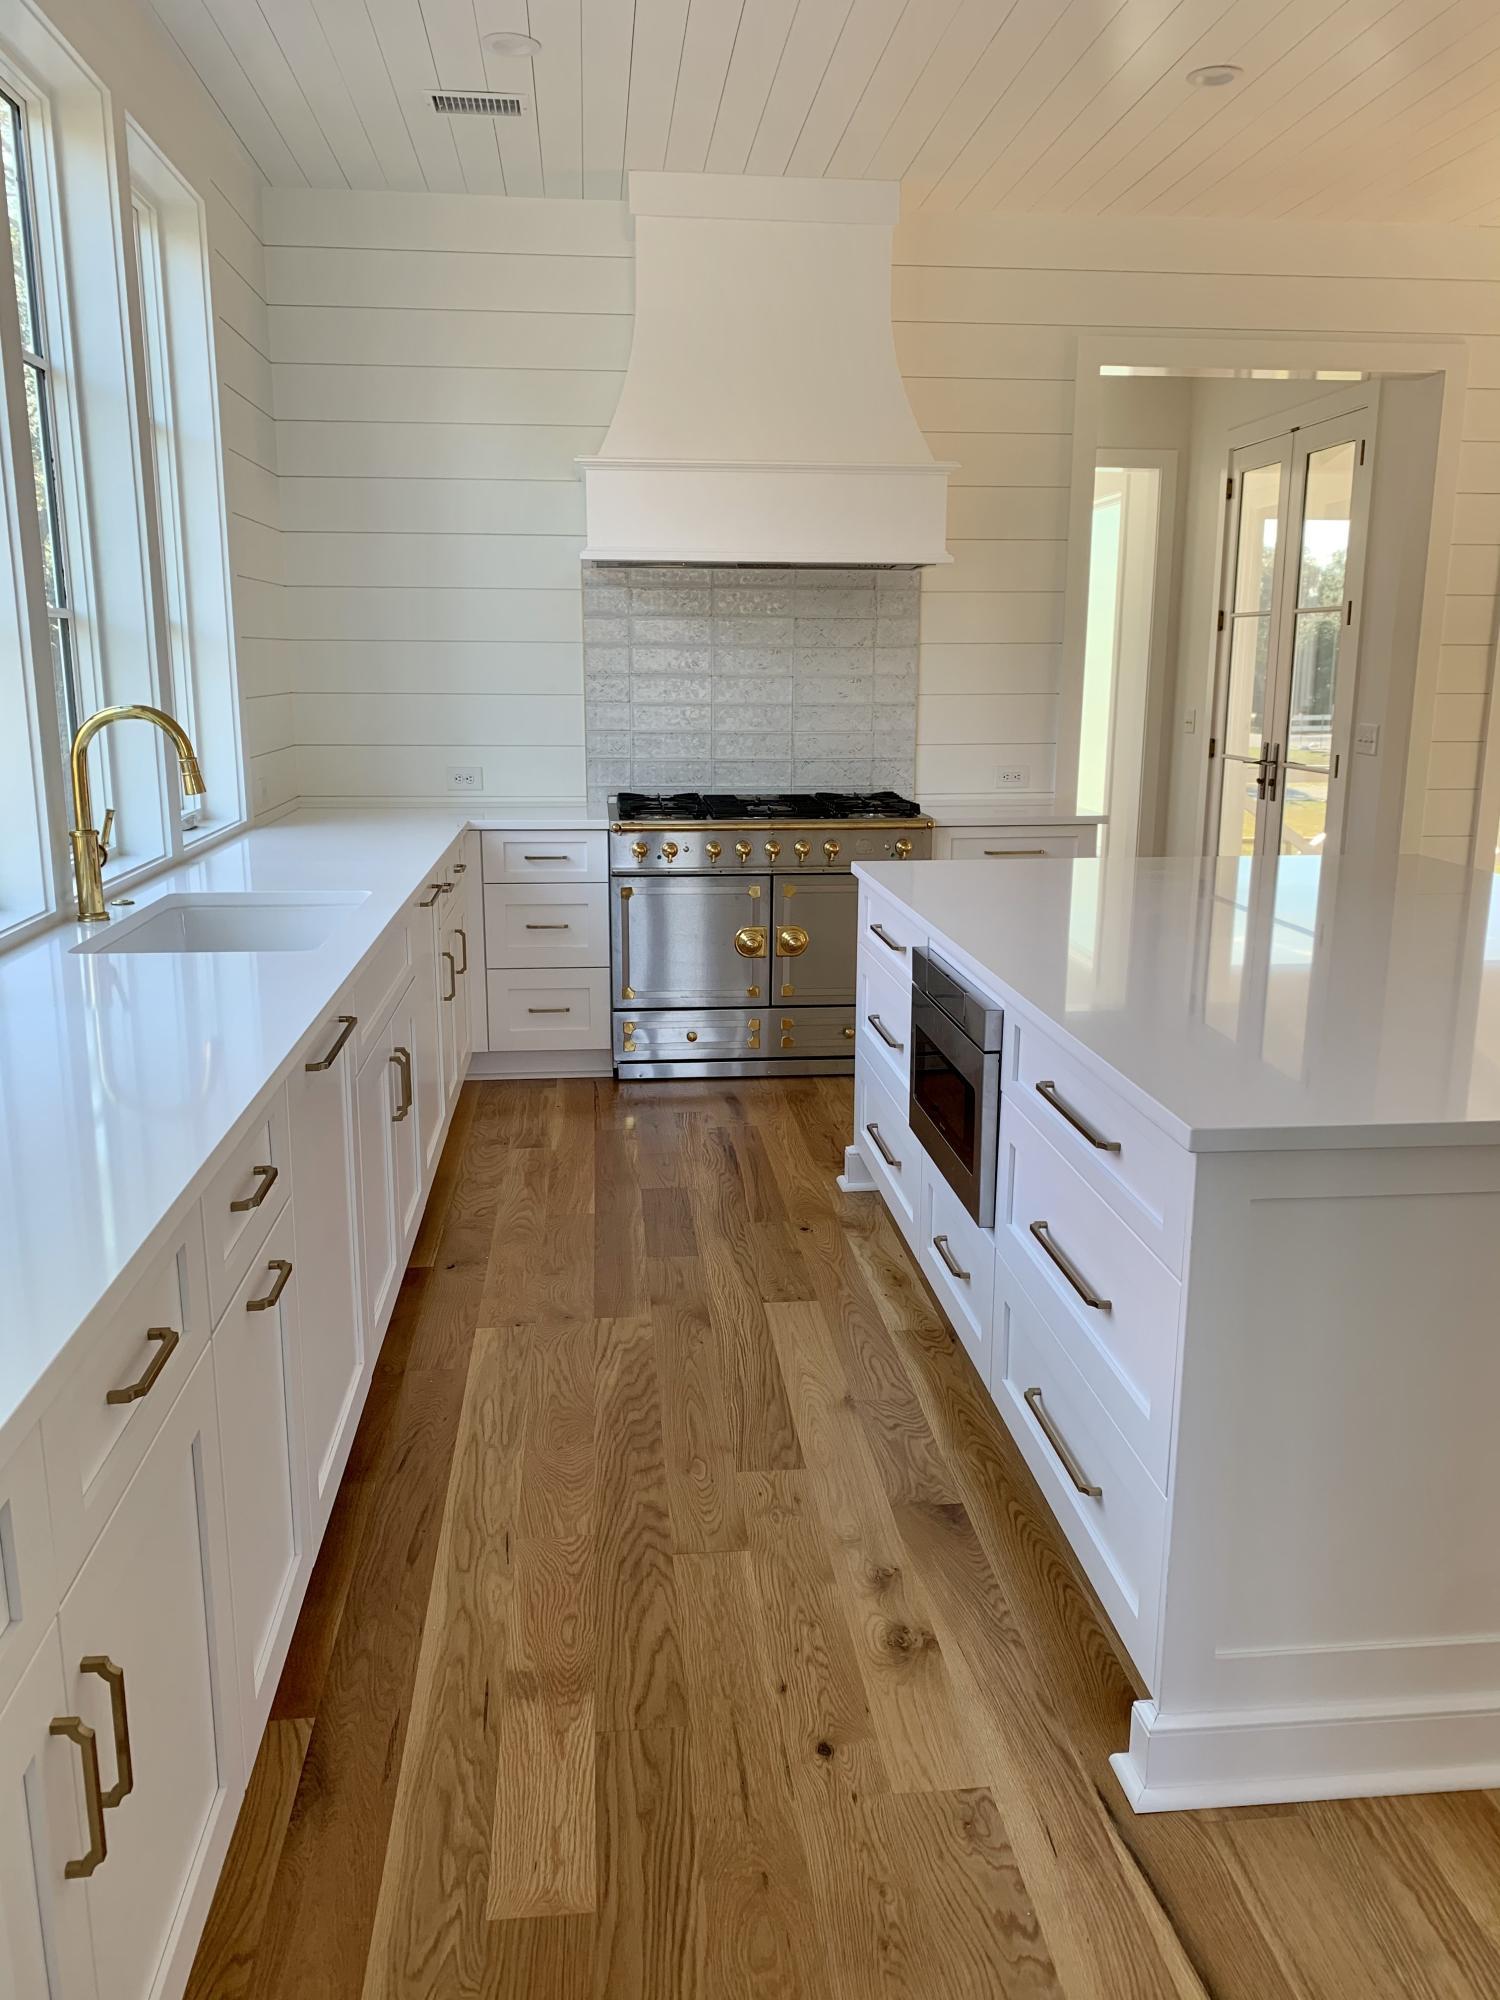 None Homes For Sale - 3003 Middle, Sullivans Island, SC - 23